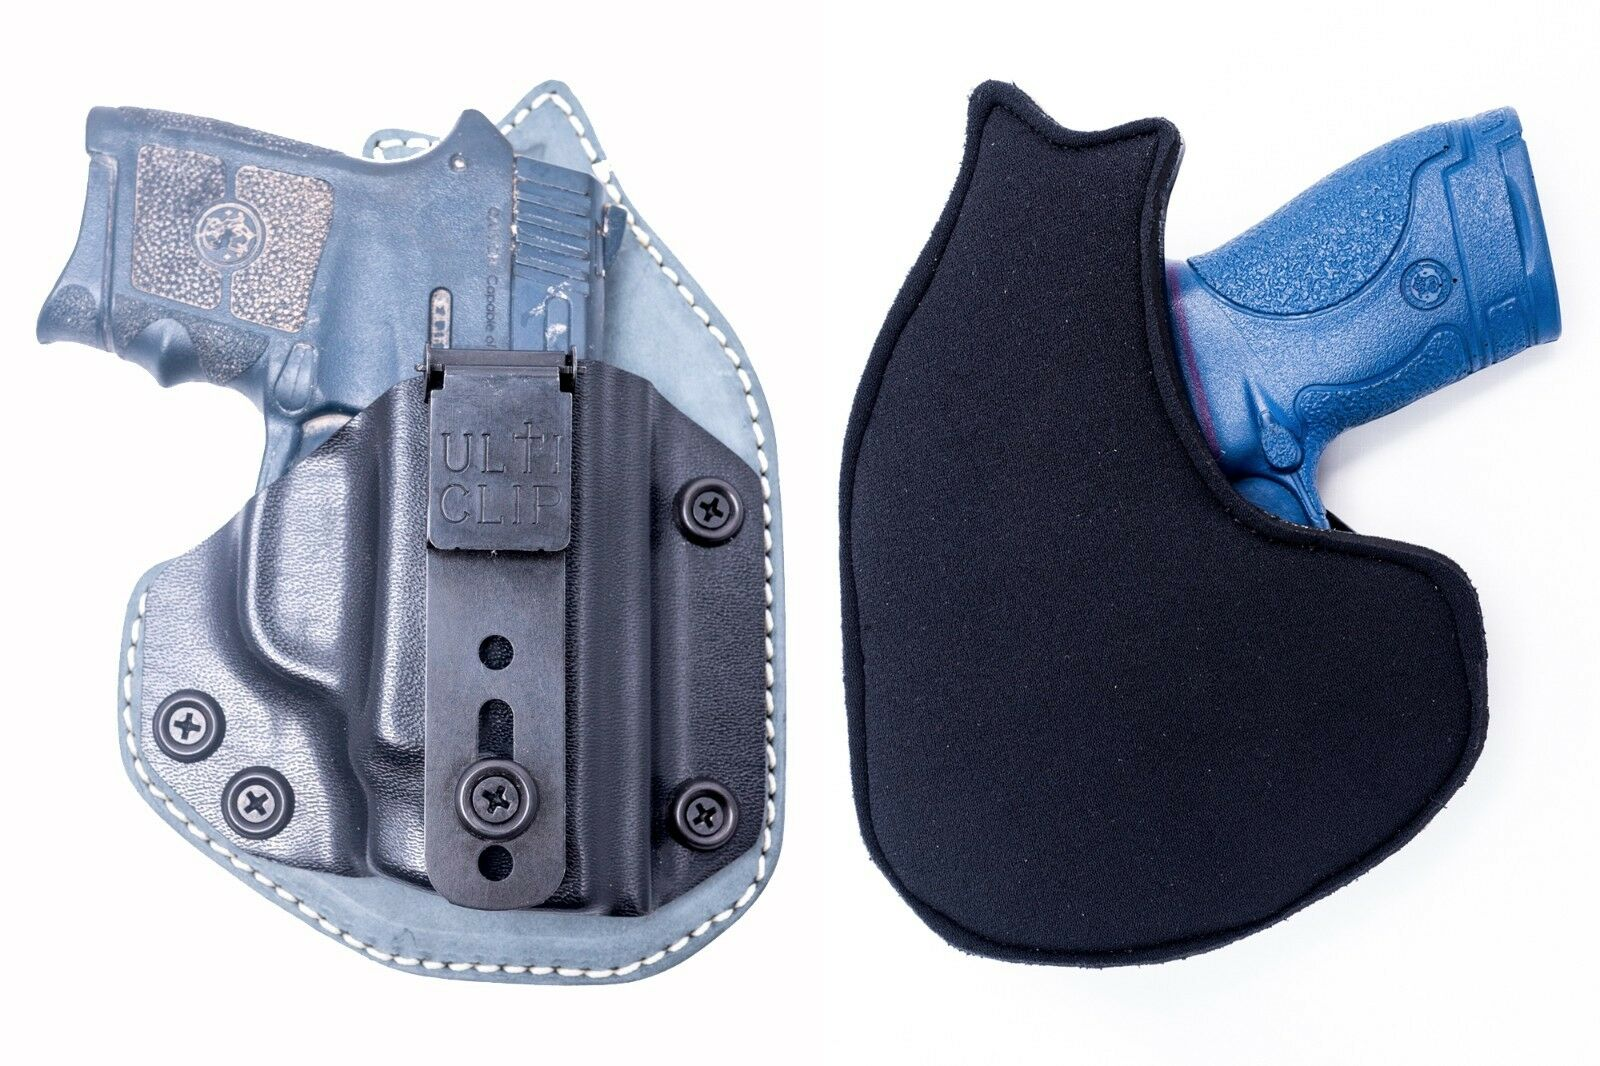 S&W Bodyguard w  laser   Kydex Leather Neoprene Hybrid IWB Appendix Carry